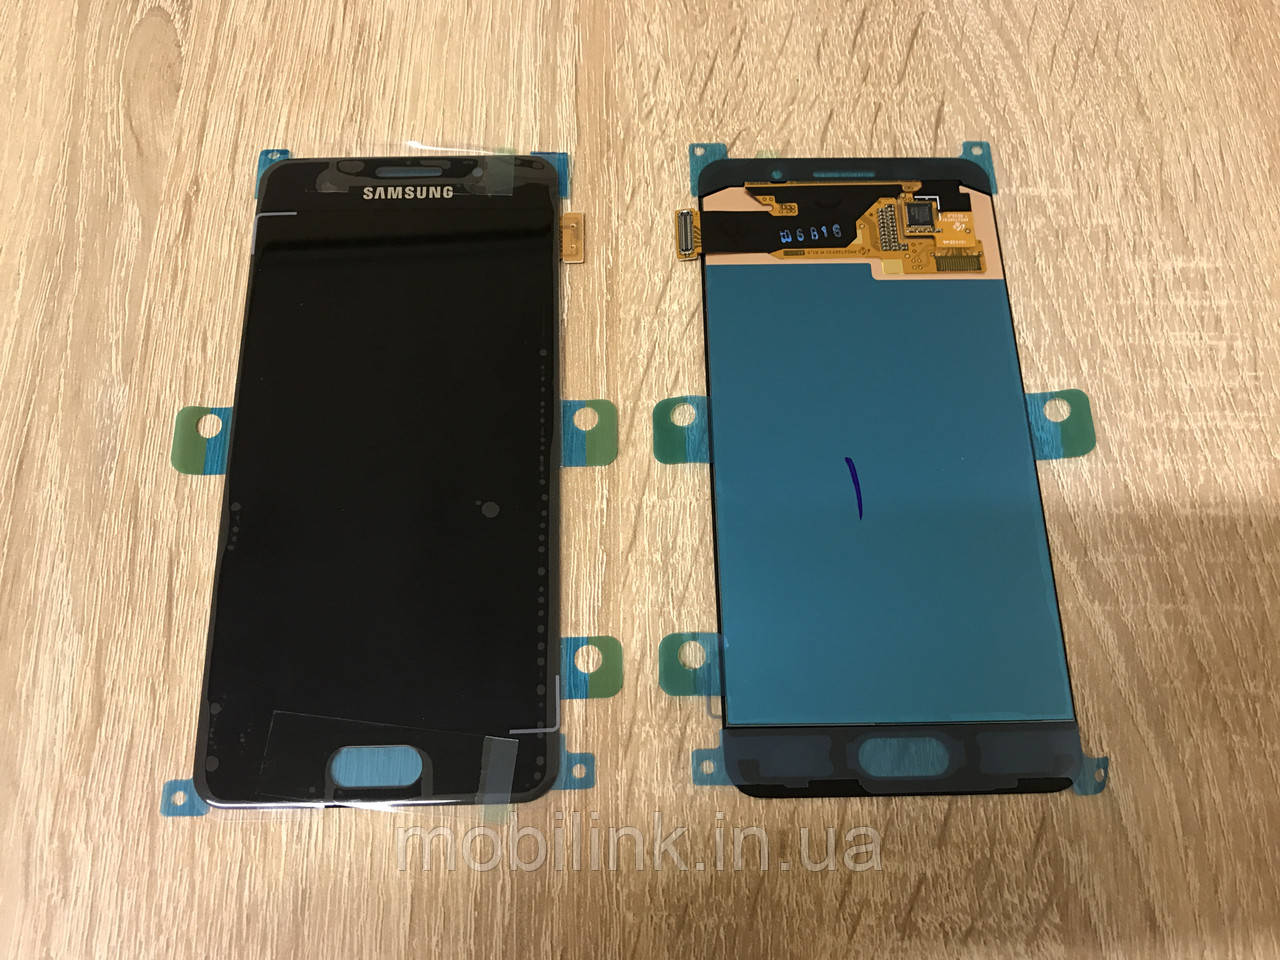 Дисплей на Samsung A310 Galaxy A3(2016) Чёрный(Black),GH97-18249B, Super AMOLED!